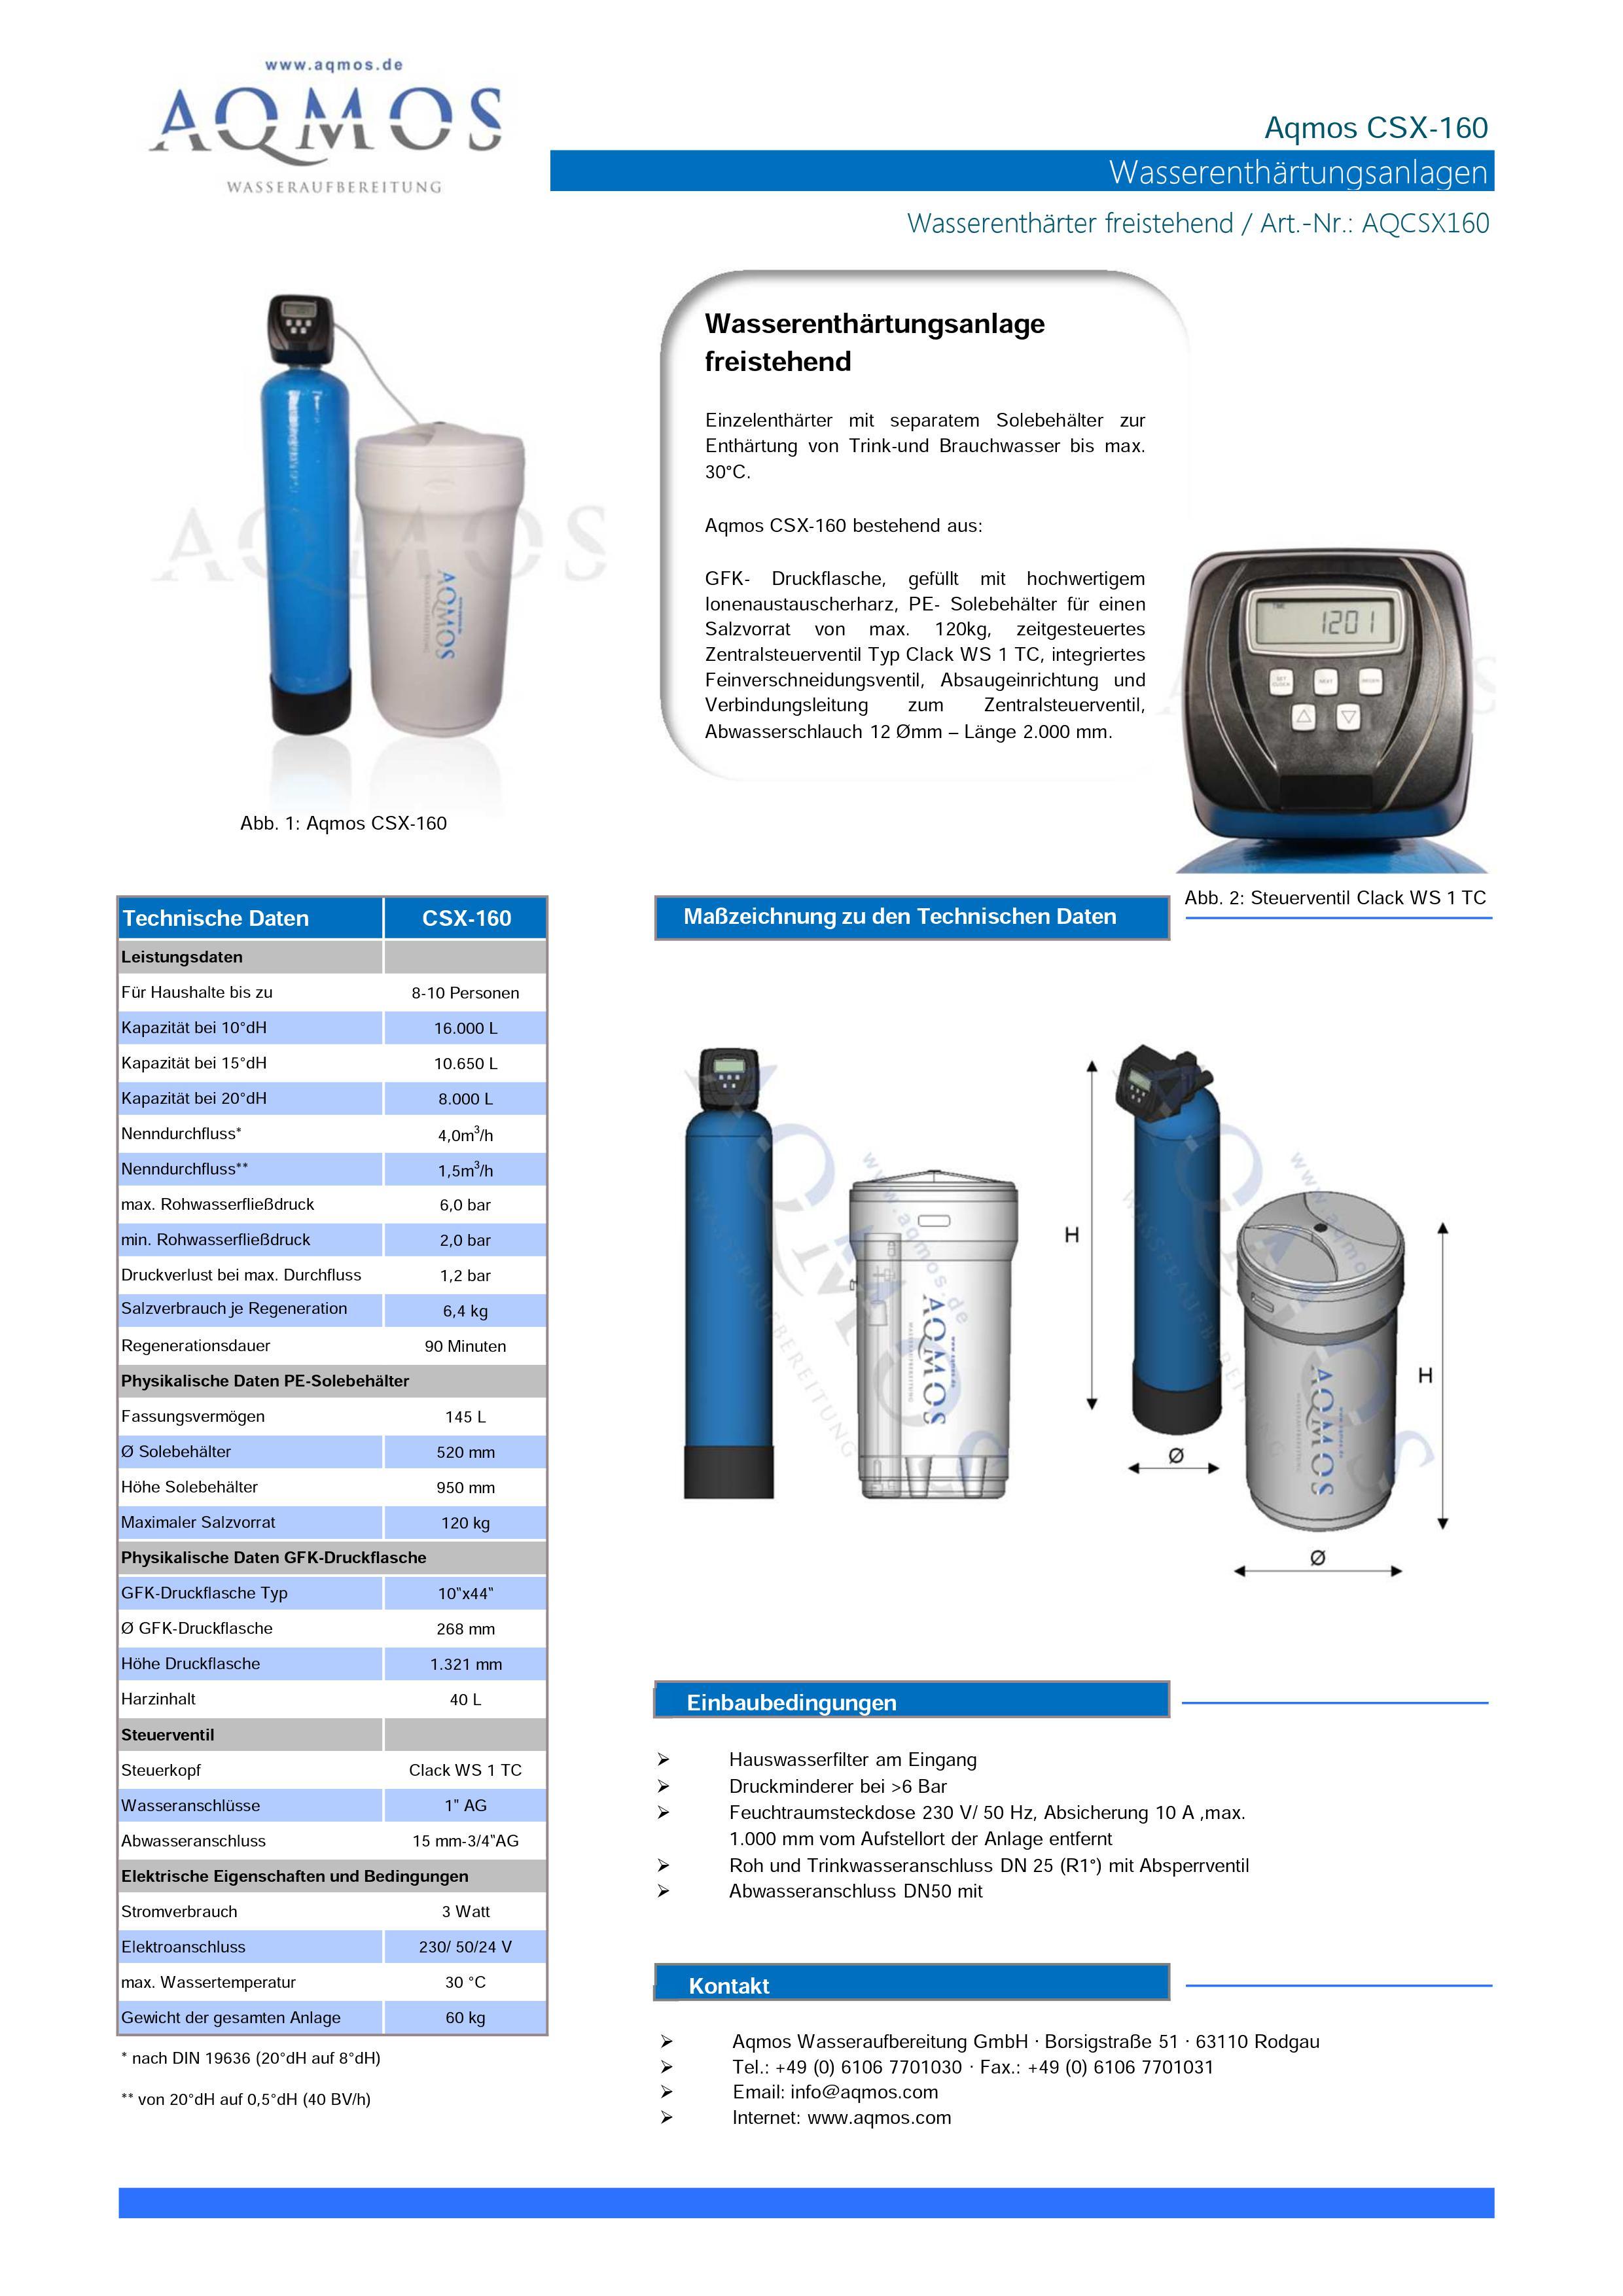 CSX-160-Datenblatt